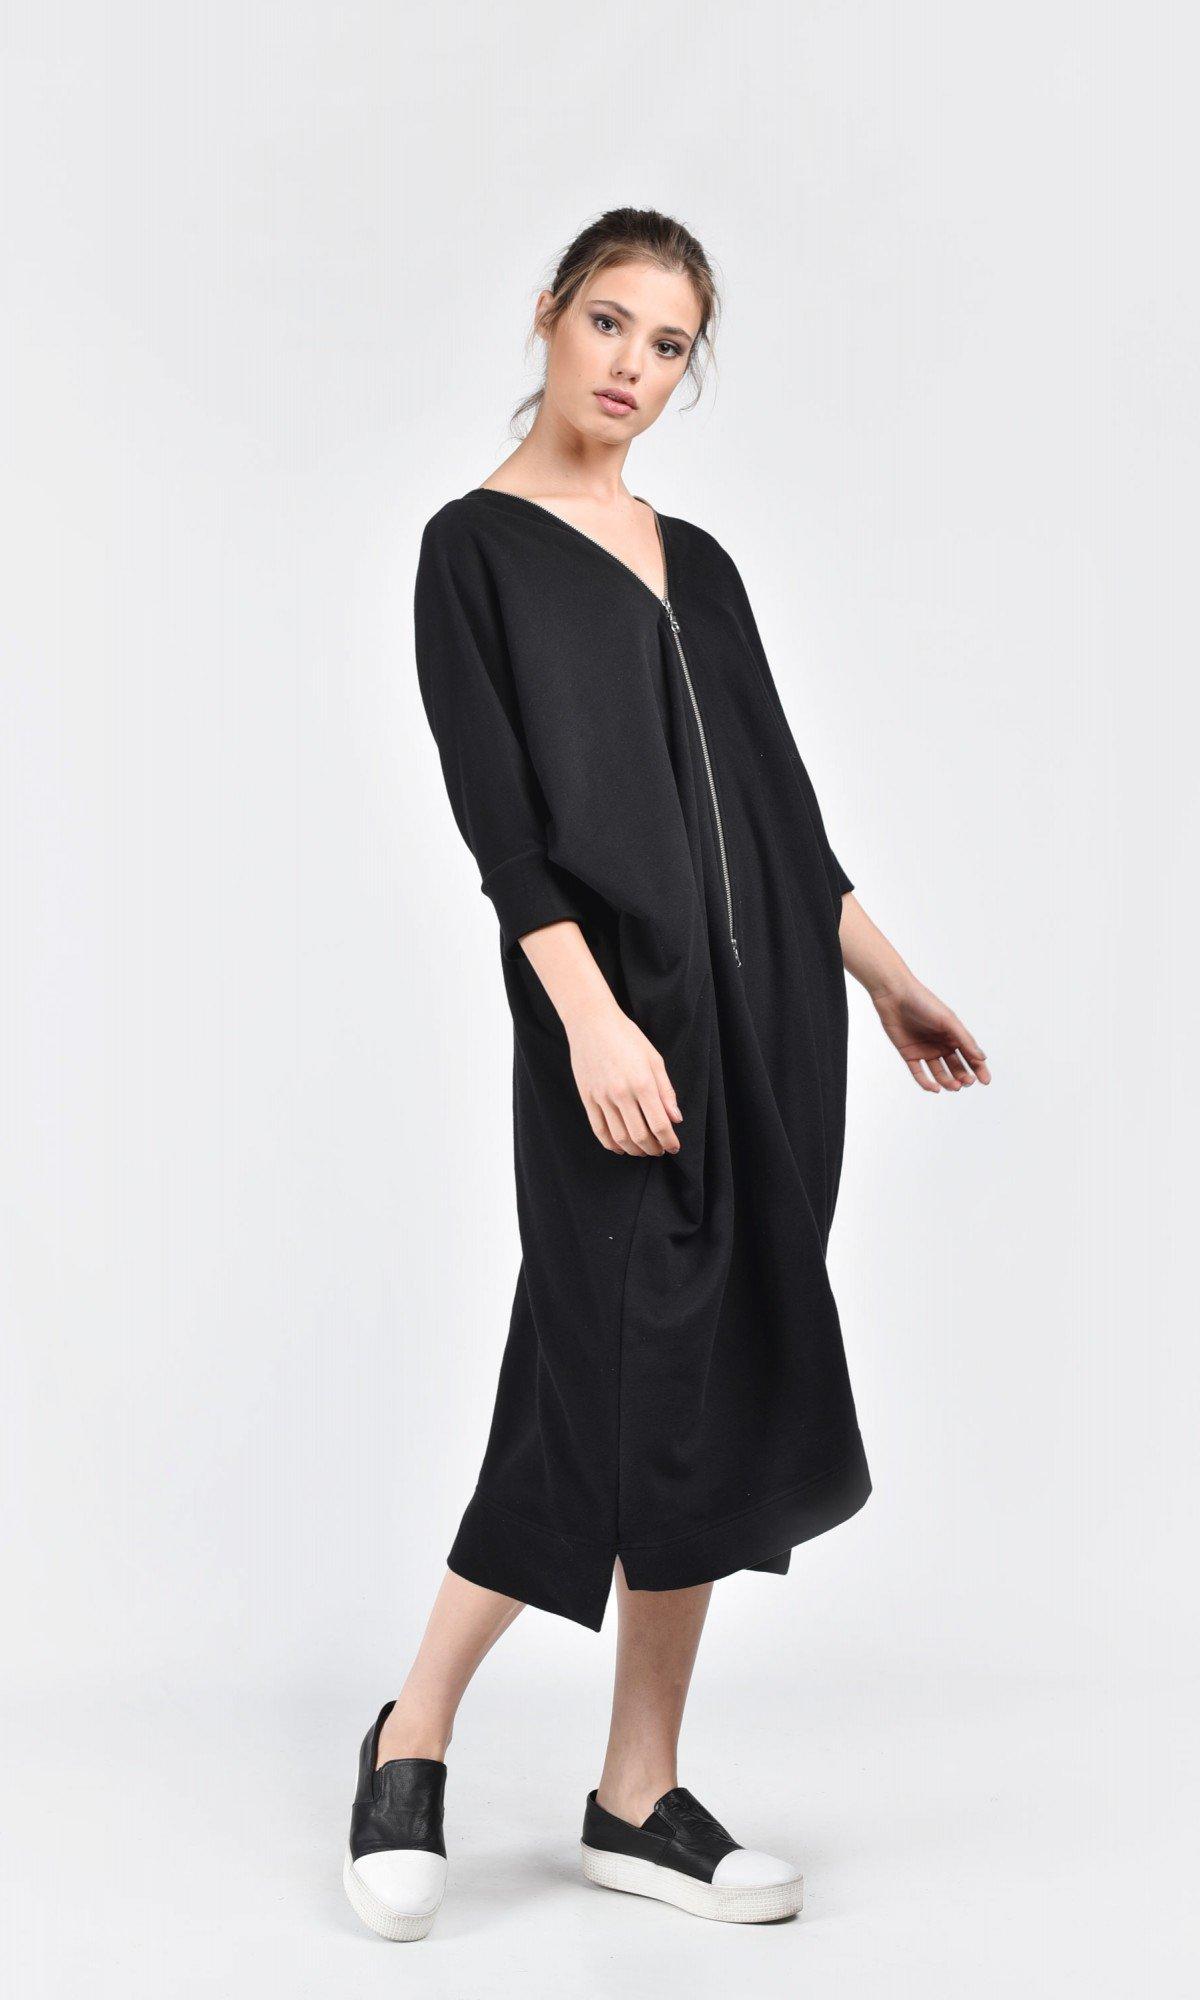 Oversized Cotton Dress with Long Zipper